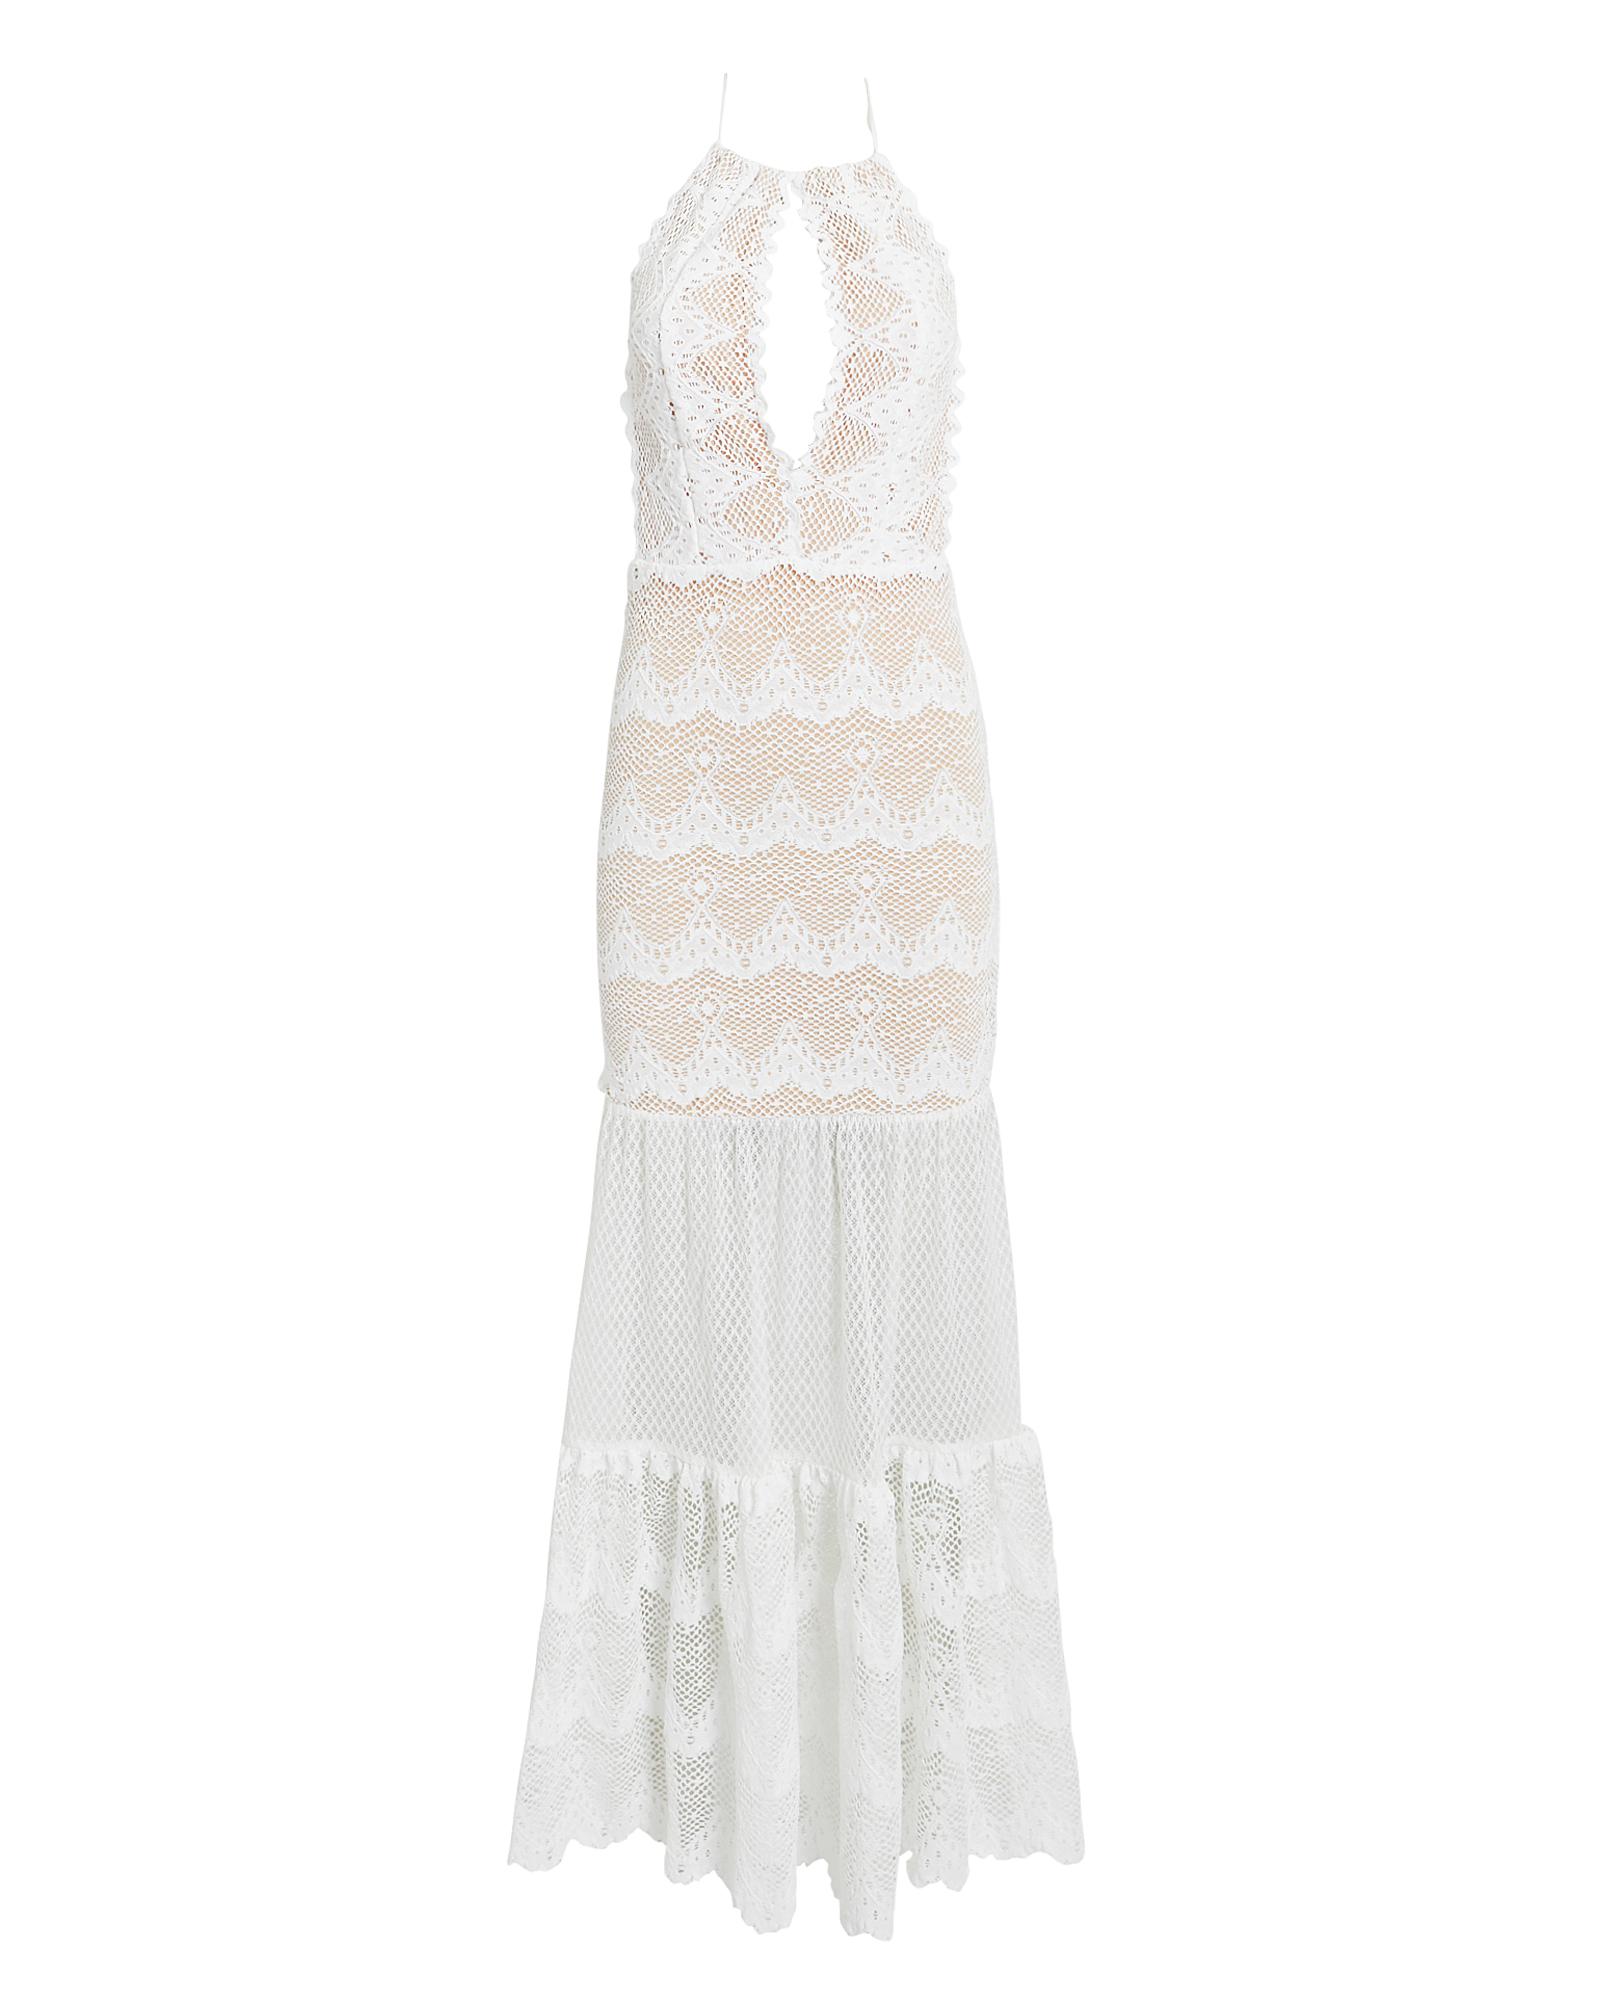 NIGHTCAP CLOTHING Belle Maxi Dress